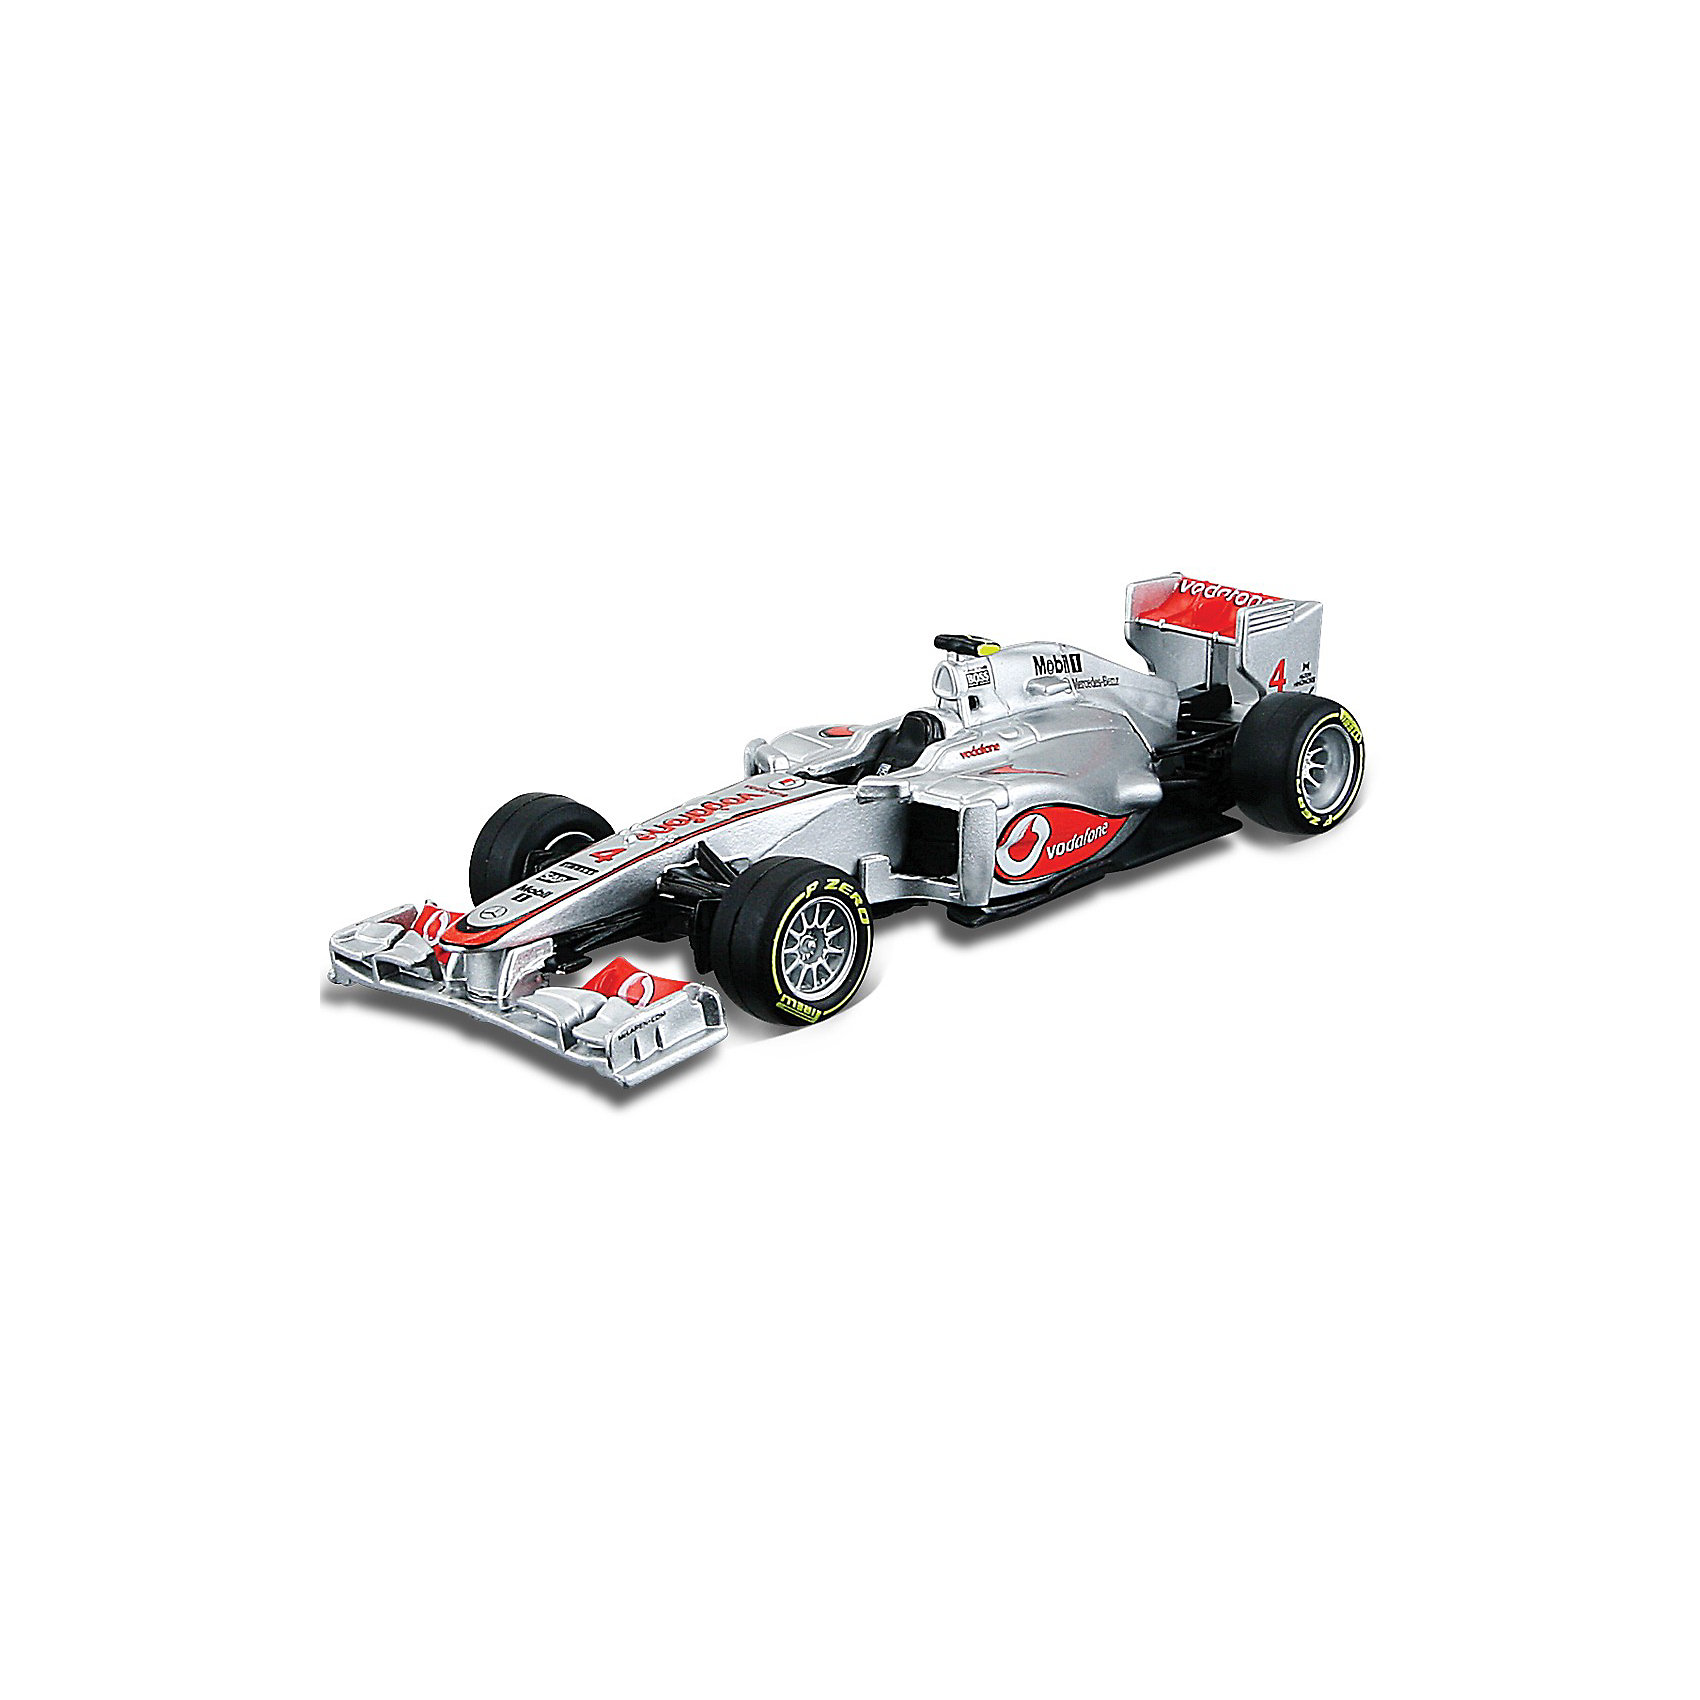 Bburago Машина Формула-1 Команда 2012 McLaren металл.,1:32, Bburago bburago 1 32 bb машина porsche cayman s металл